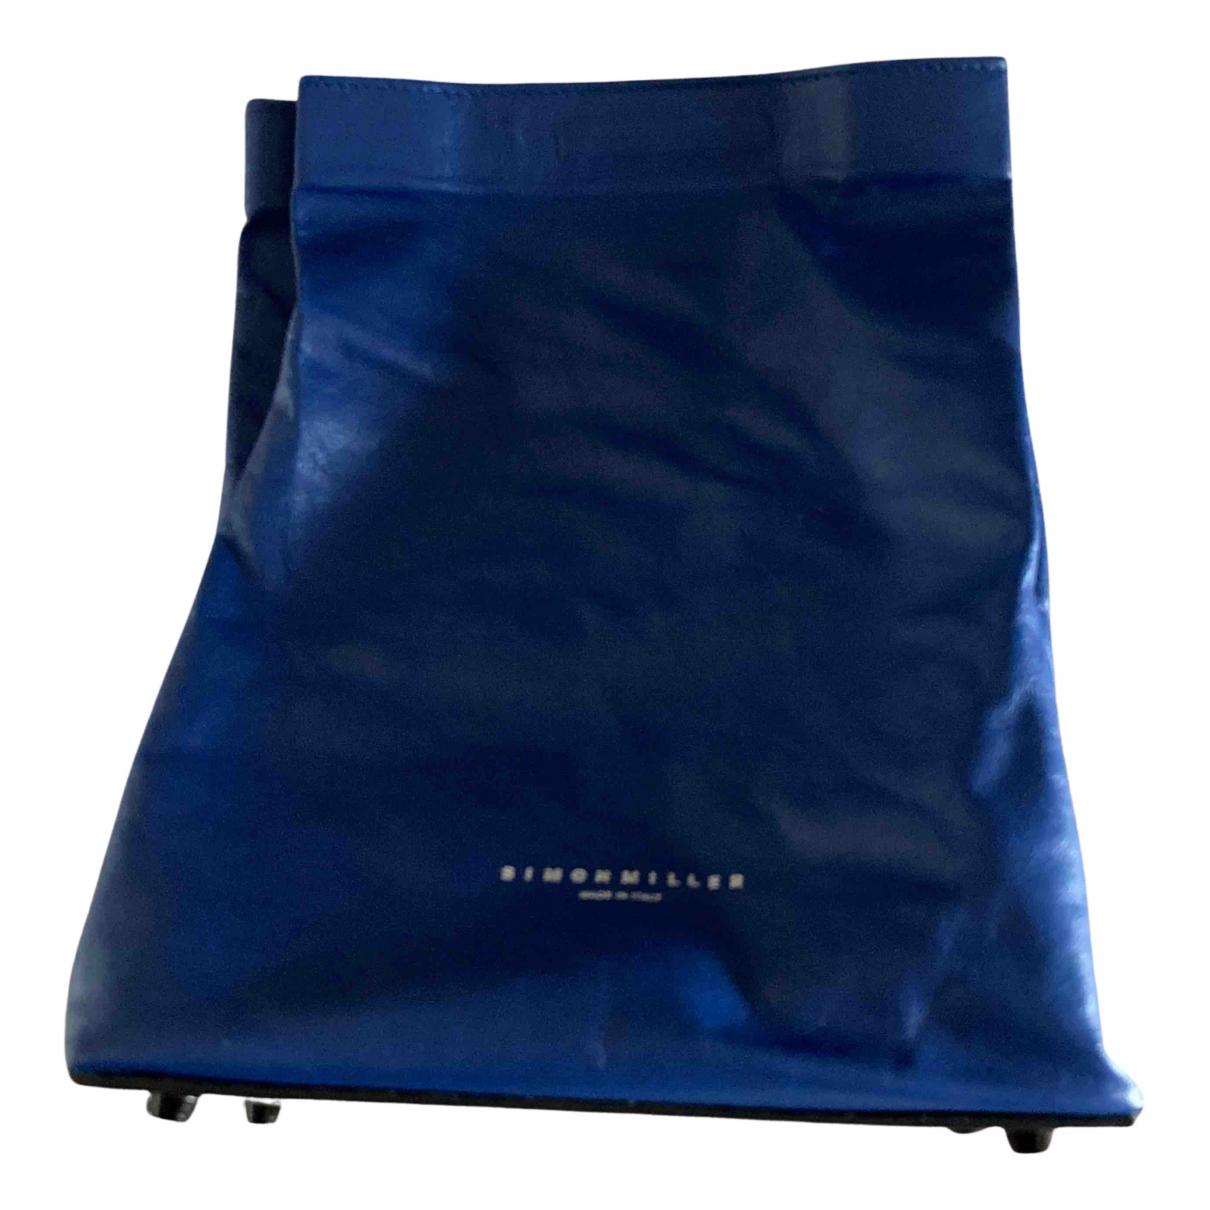 Simon Miller Small Lunch Bag Clutch in  Blau Leder